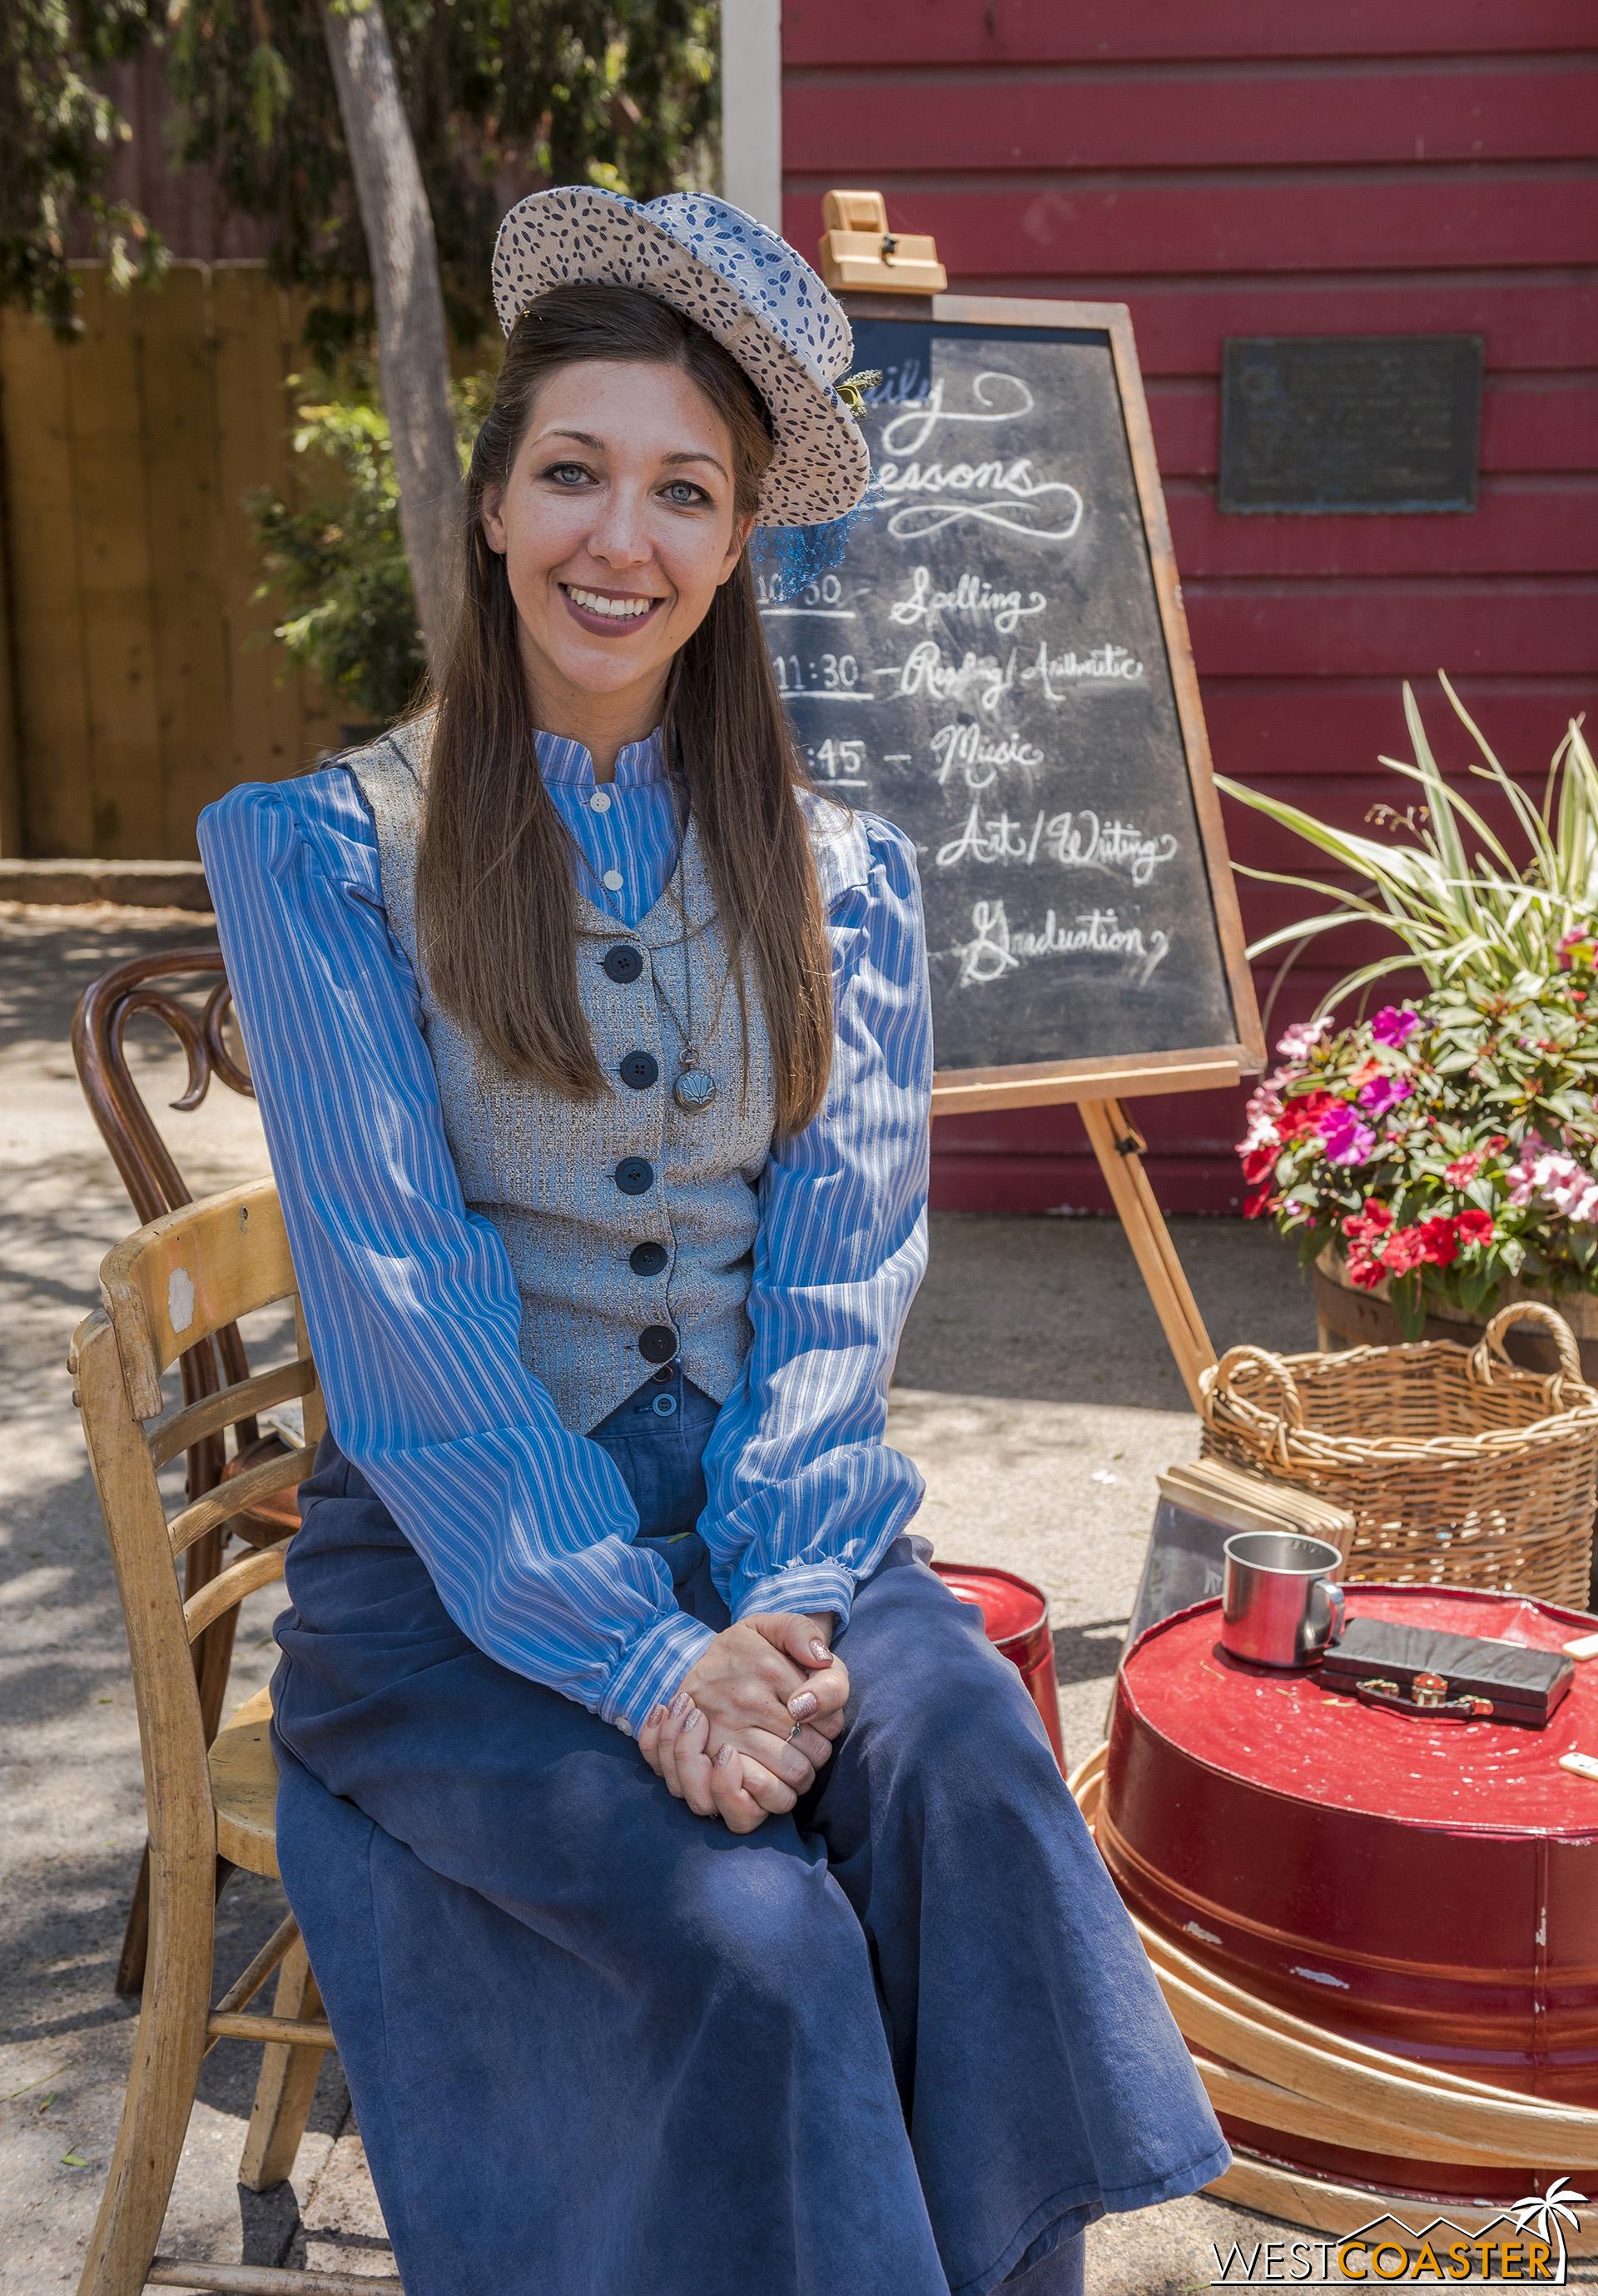 Miss Sierra Mist retains her position as school teacher at the School House.